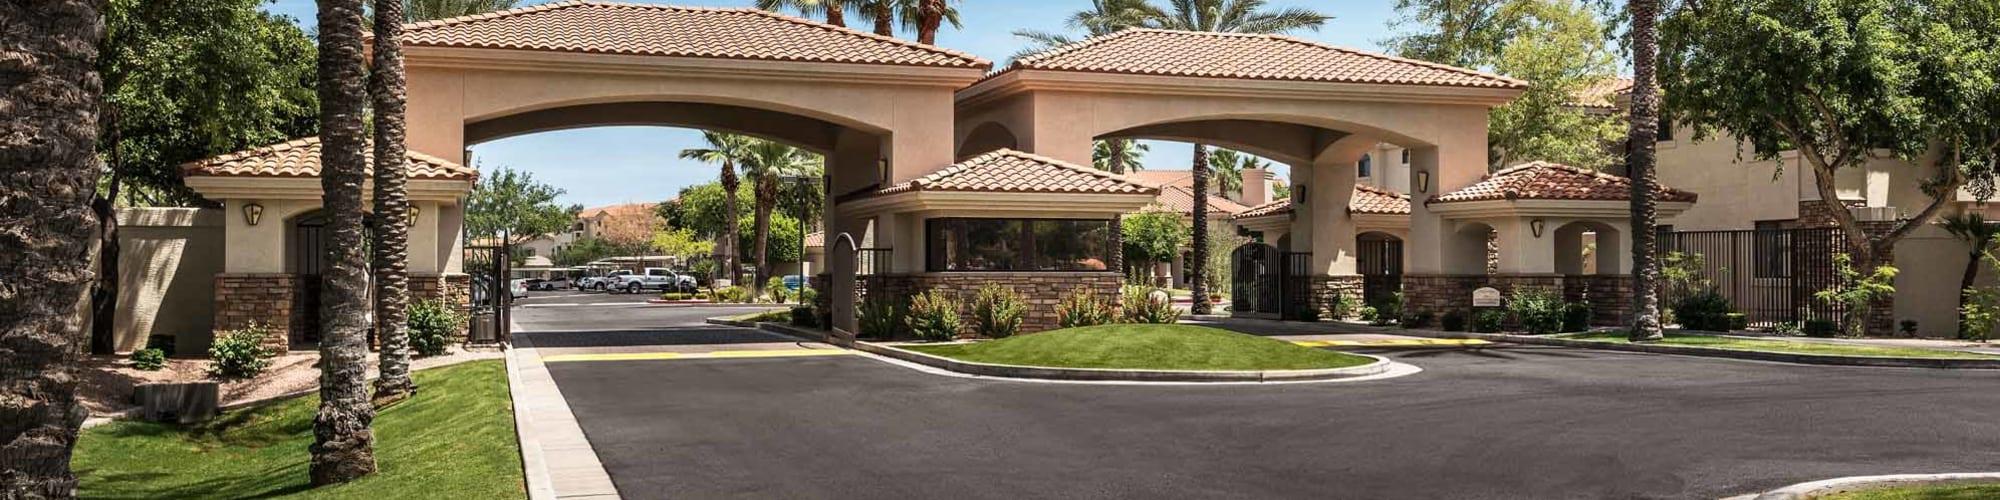 Contact us at San Marbeya in Tempe, Arizona